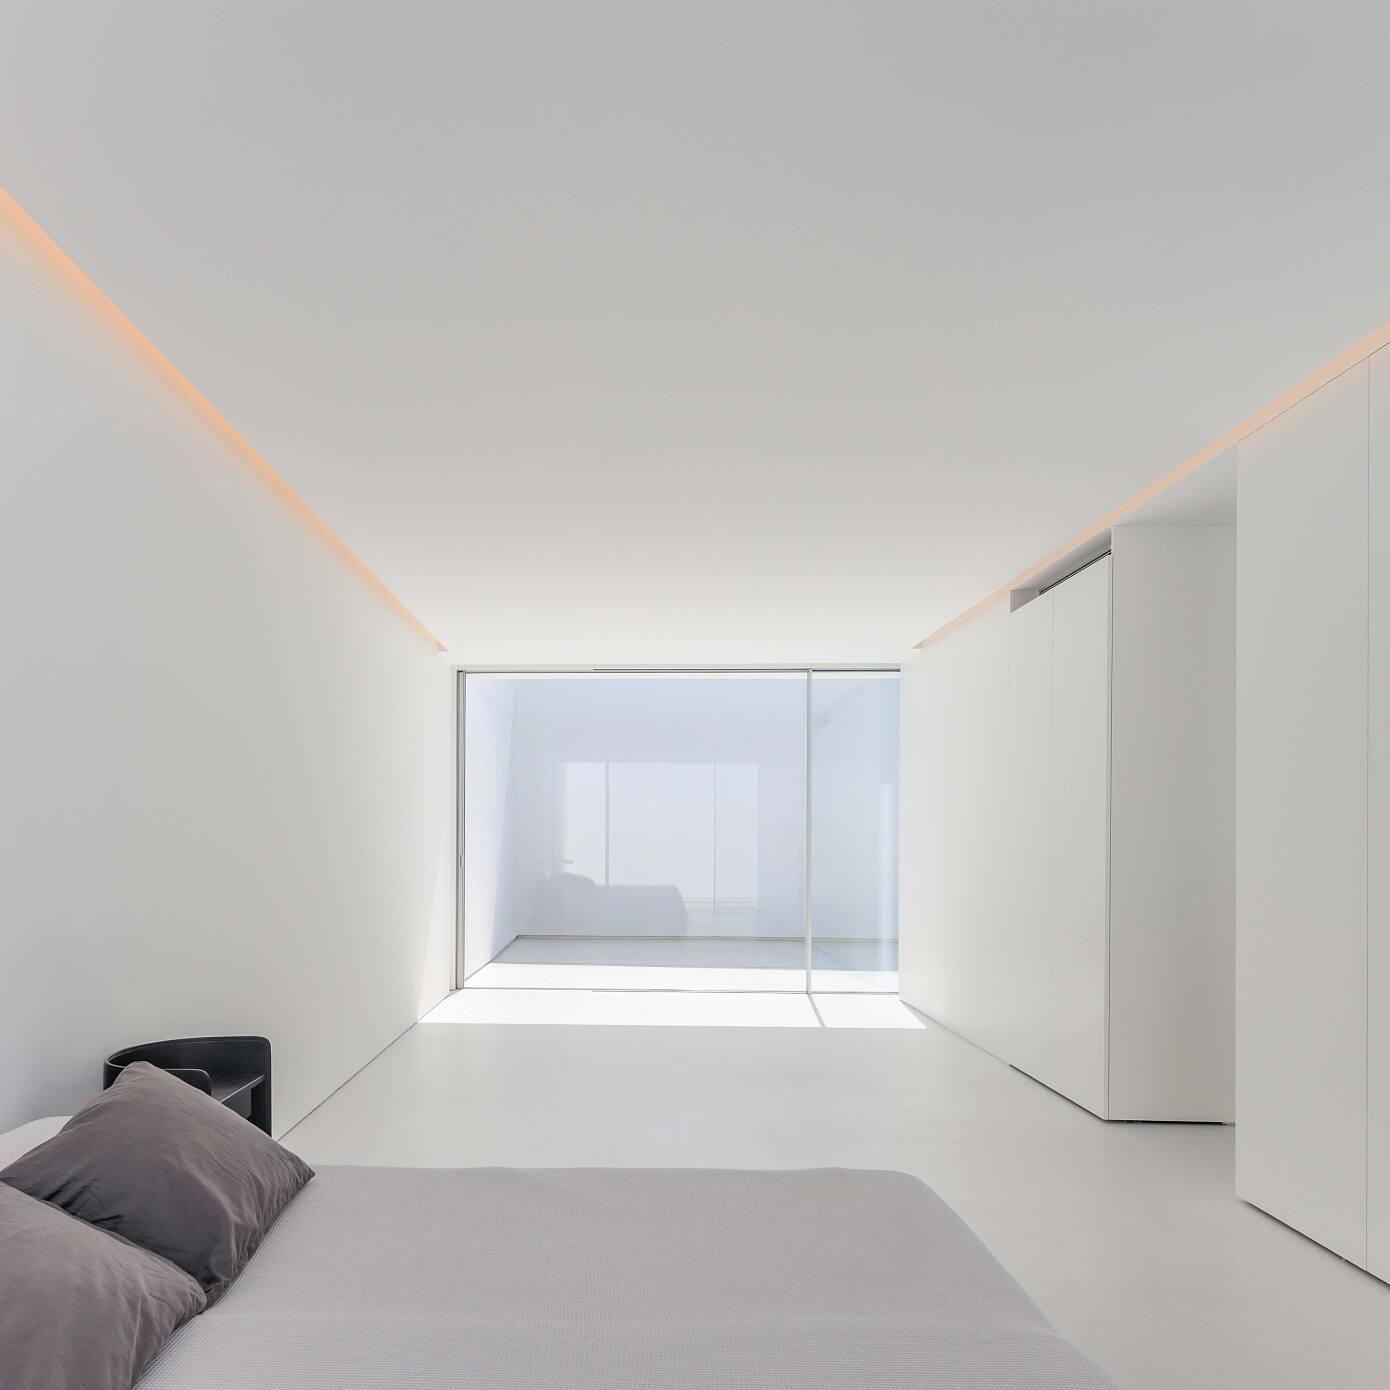 Àtic Blanc by Fran Silvestre Arquitectos